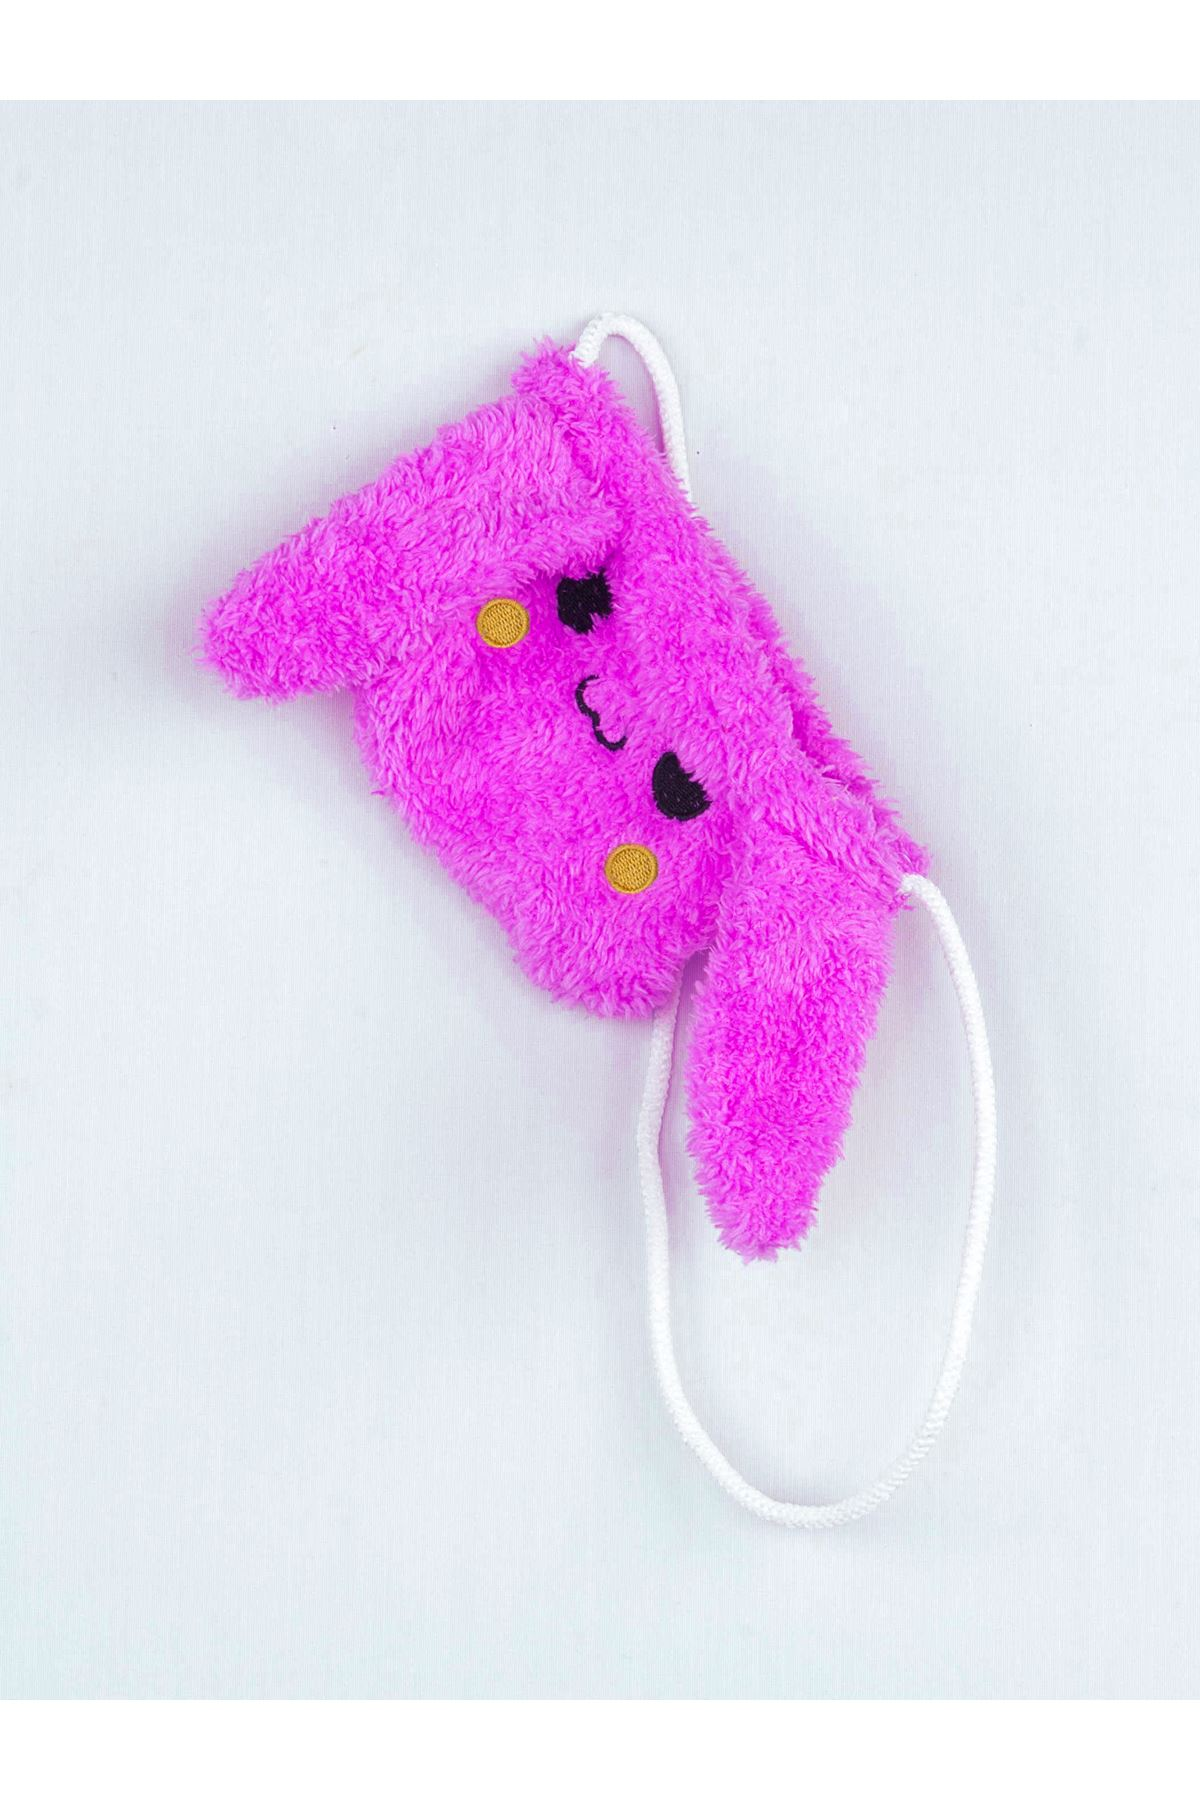 Purple Winter Plush Bag-Eared Girl Tights Suit